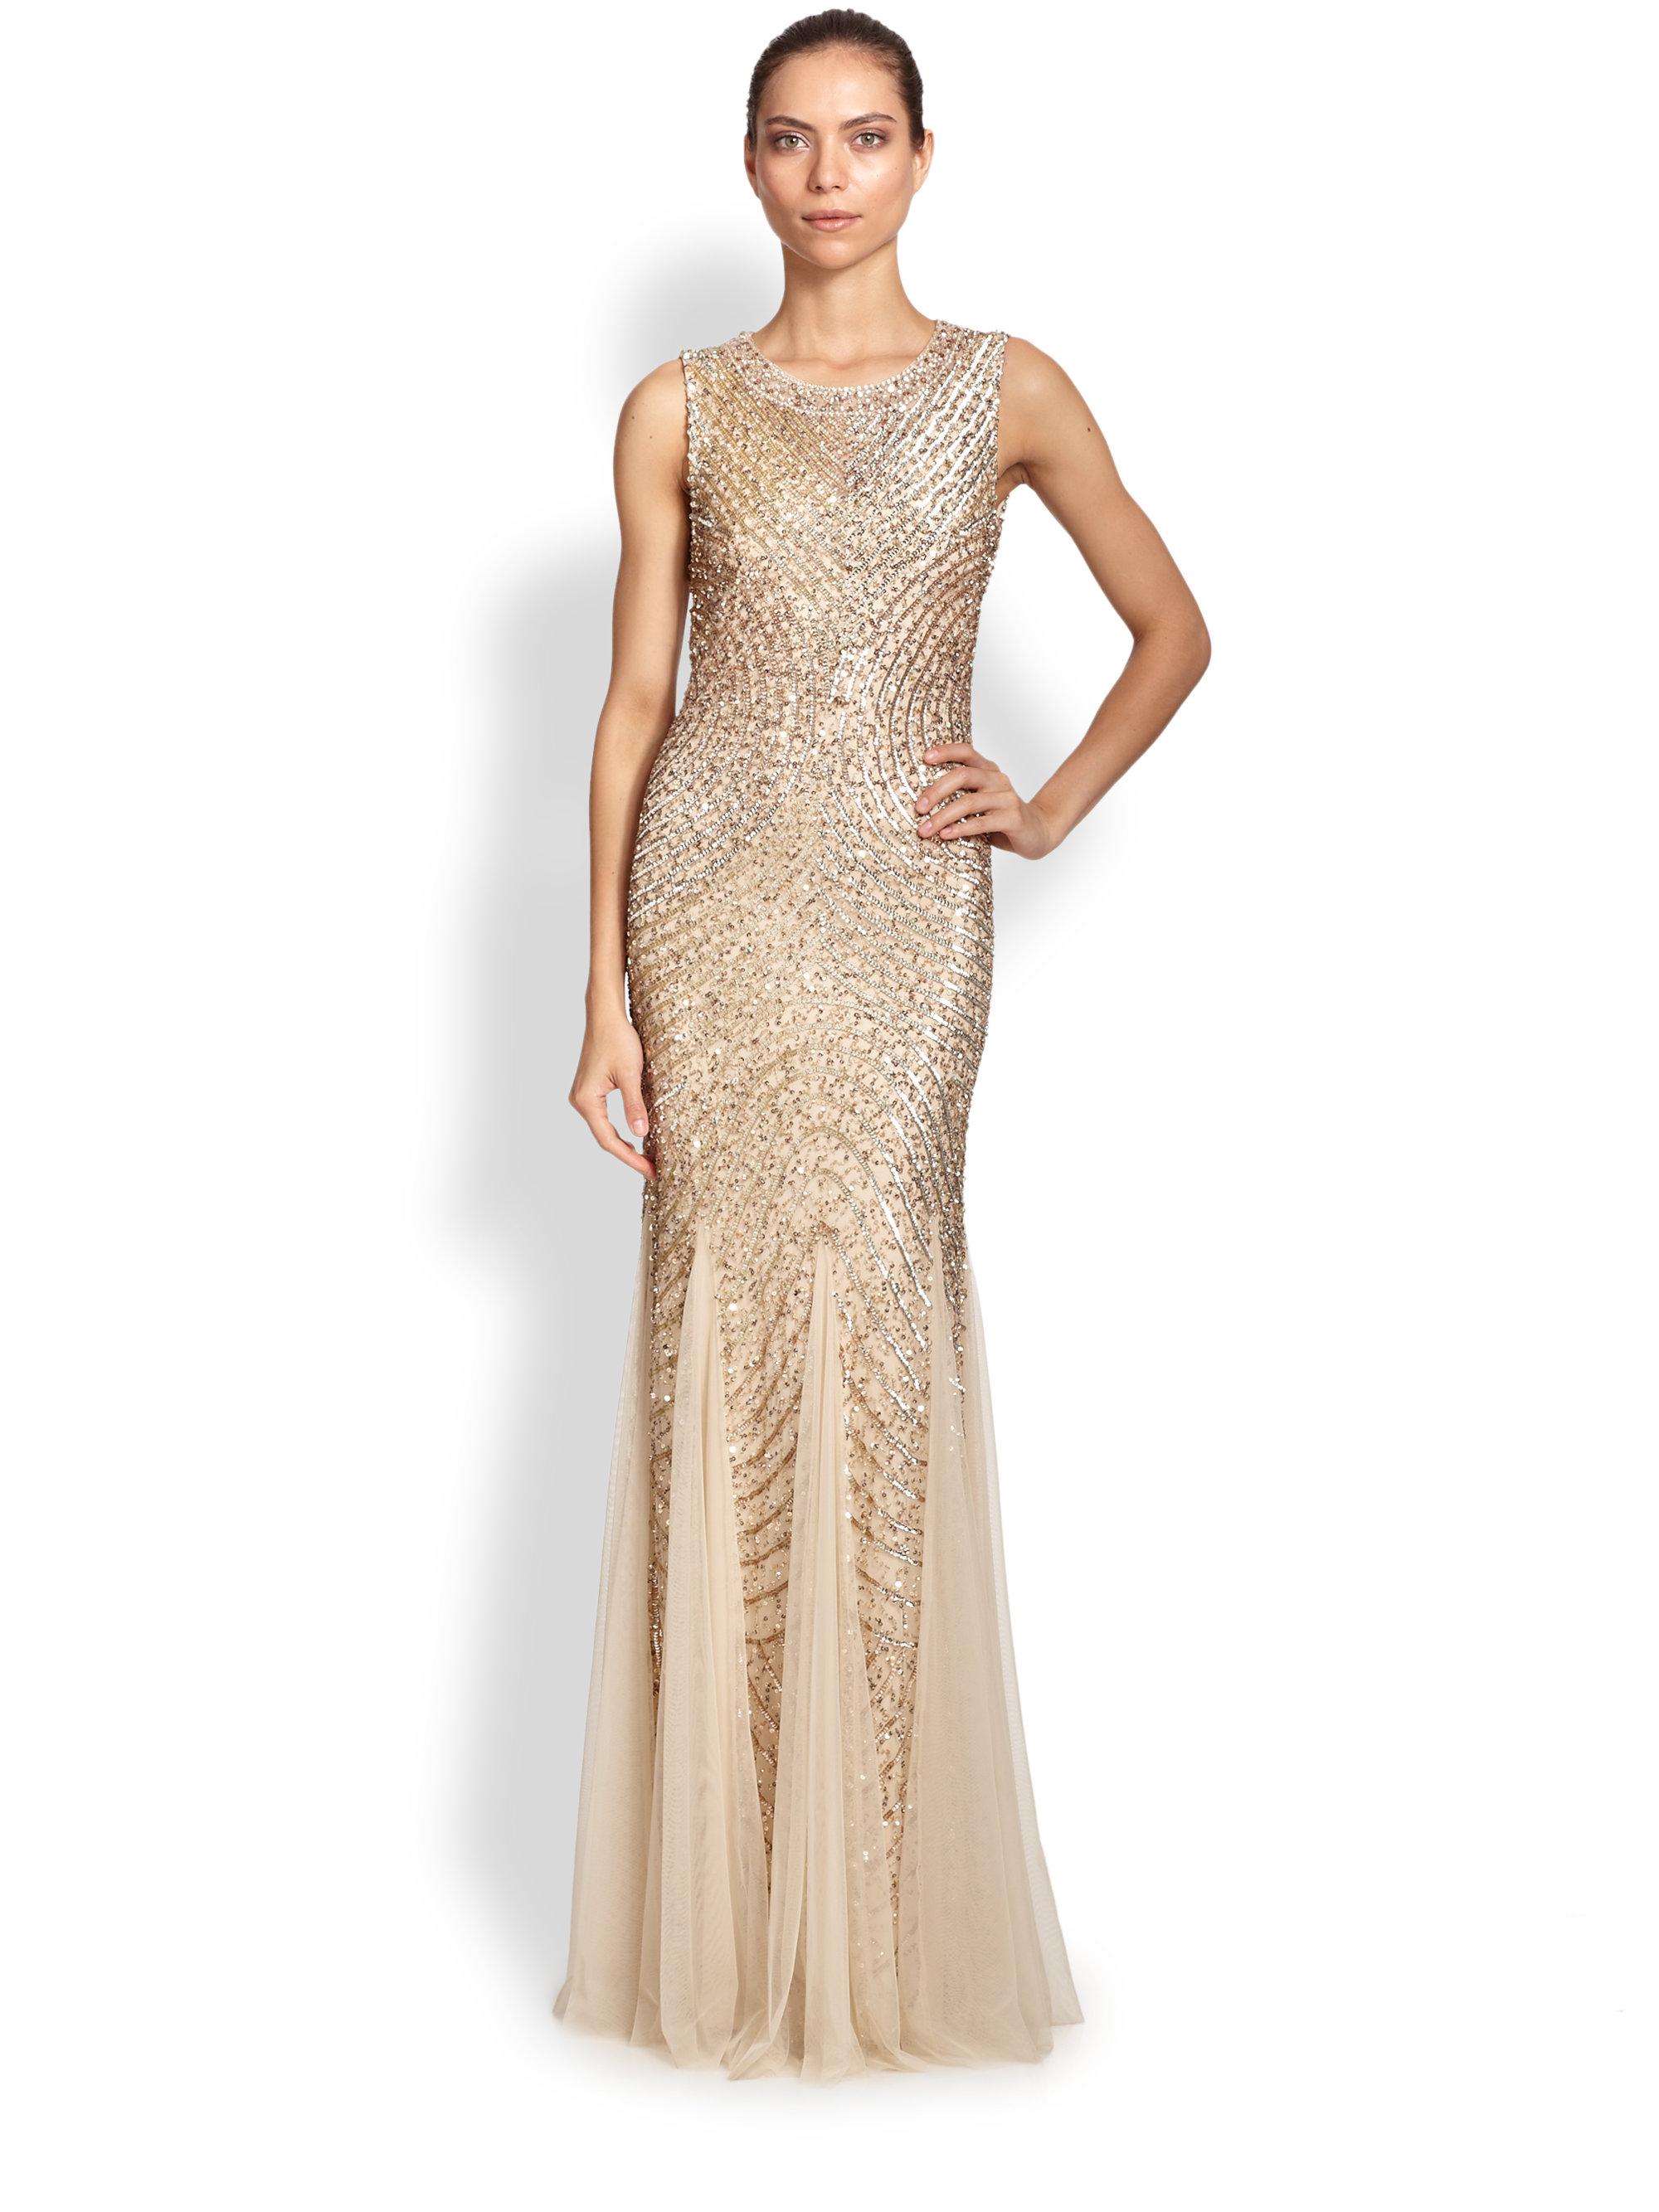 saks fifth avenue plus size dresses image collections - dresses